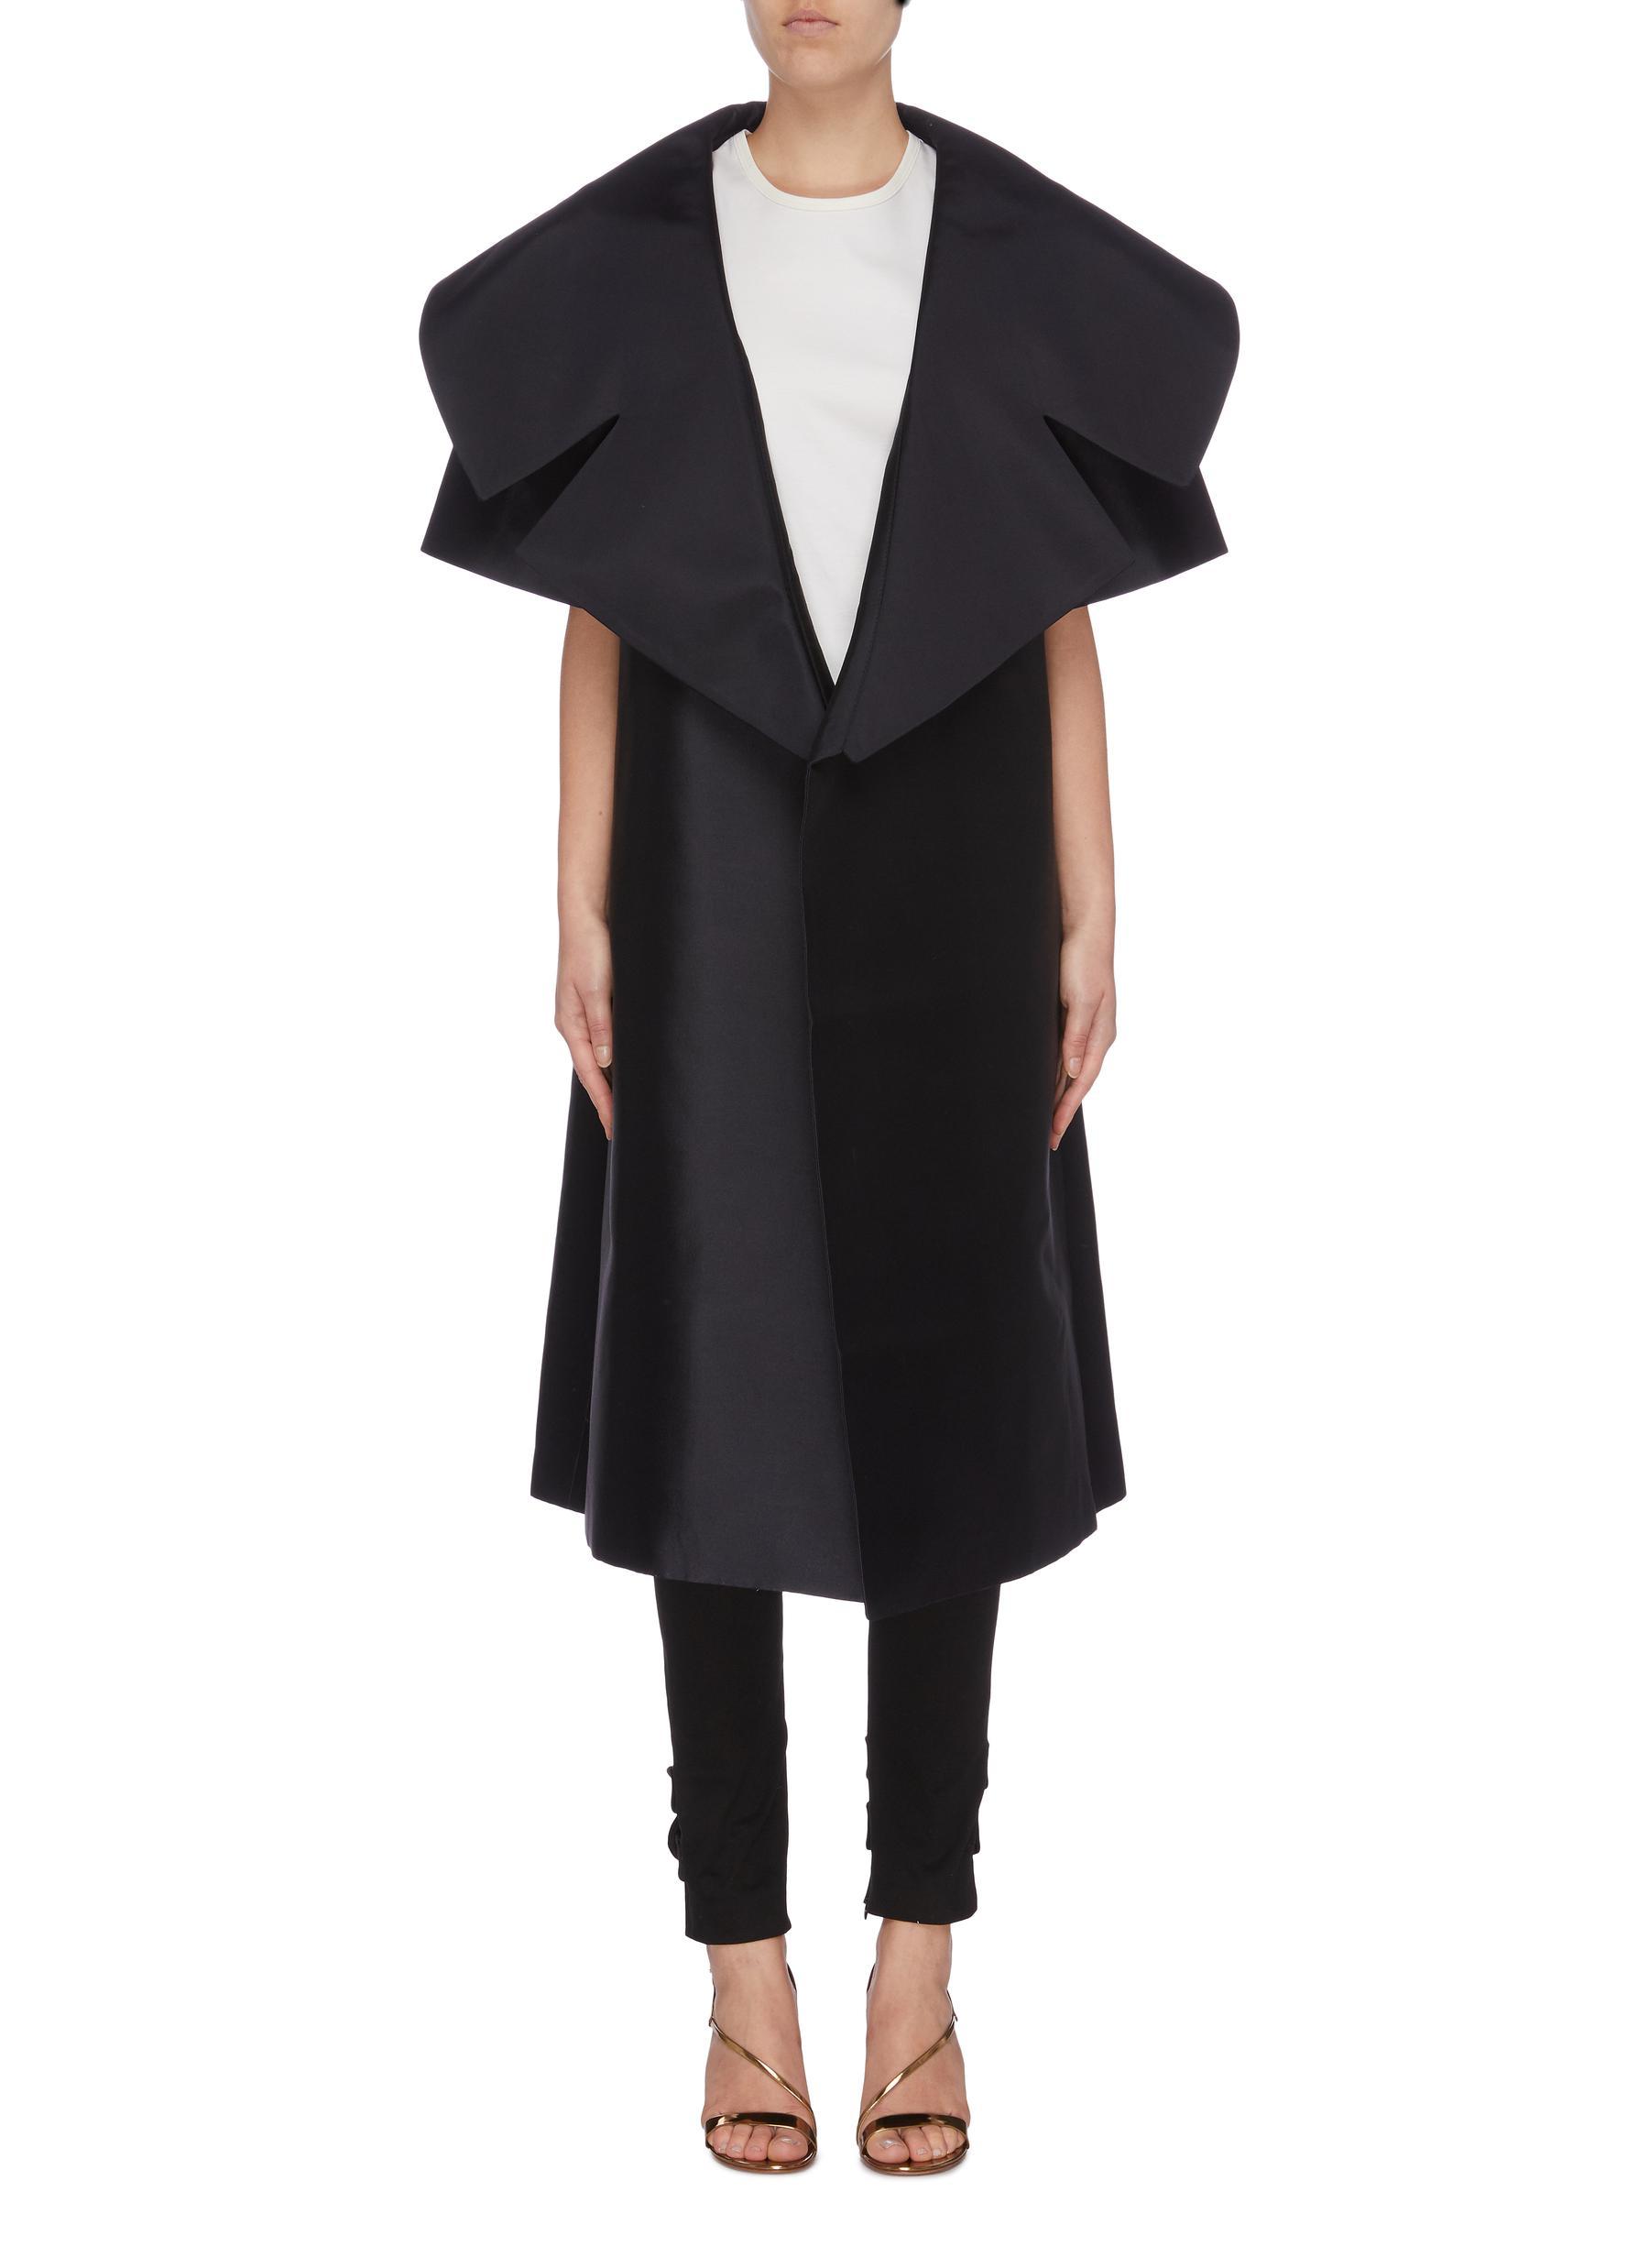 Alissa flared collar satin short sleeve coat by Leal Daccarett